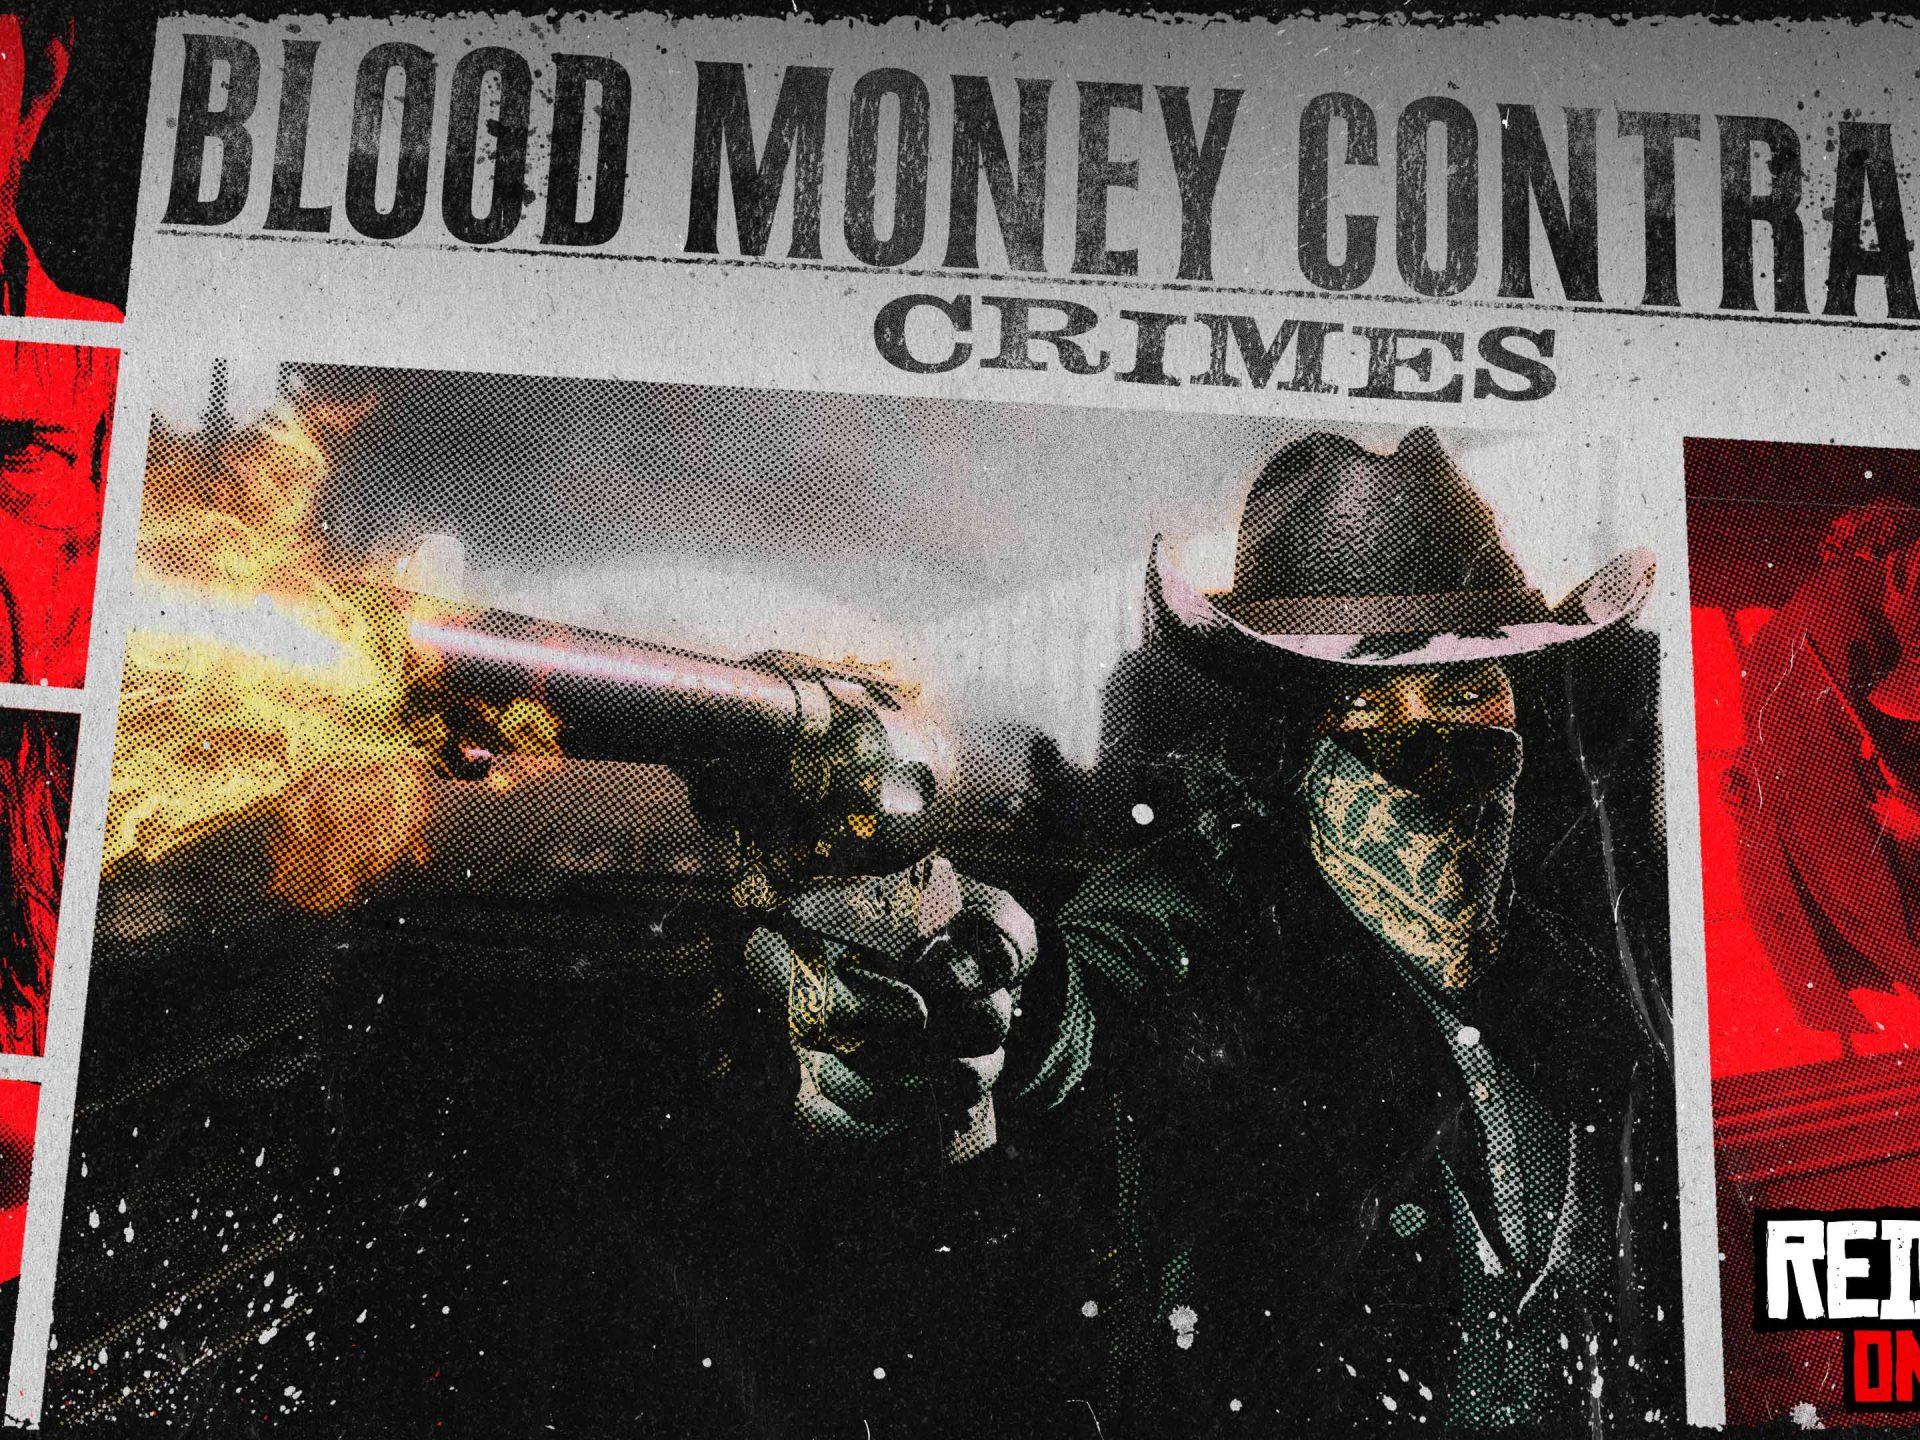 Contrats Blood Money